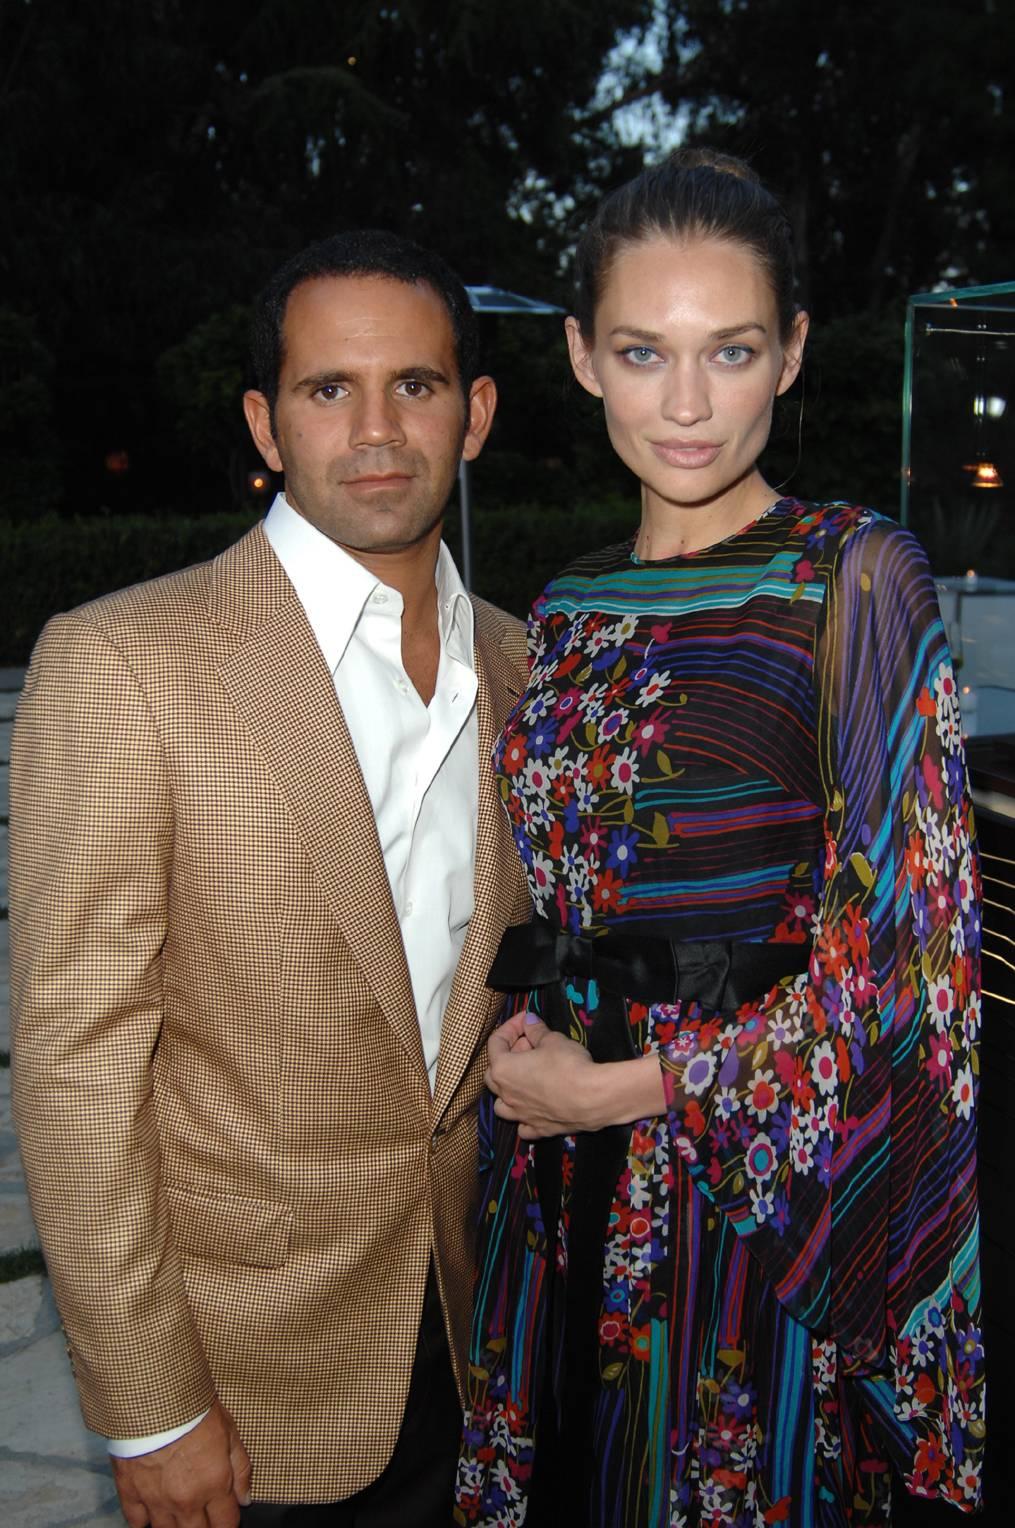 Eduardo Moises and Amber Arbucci